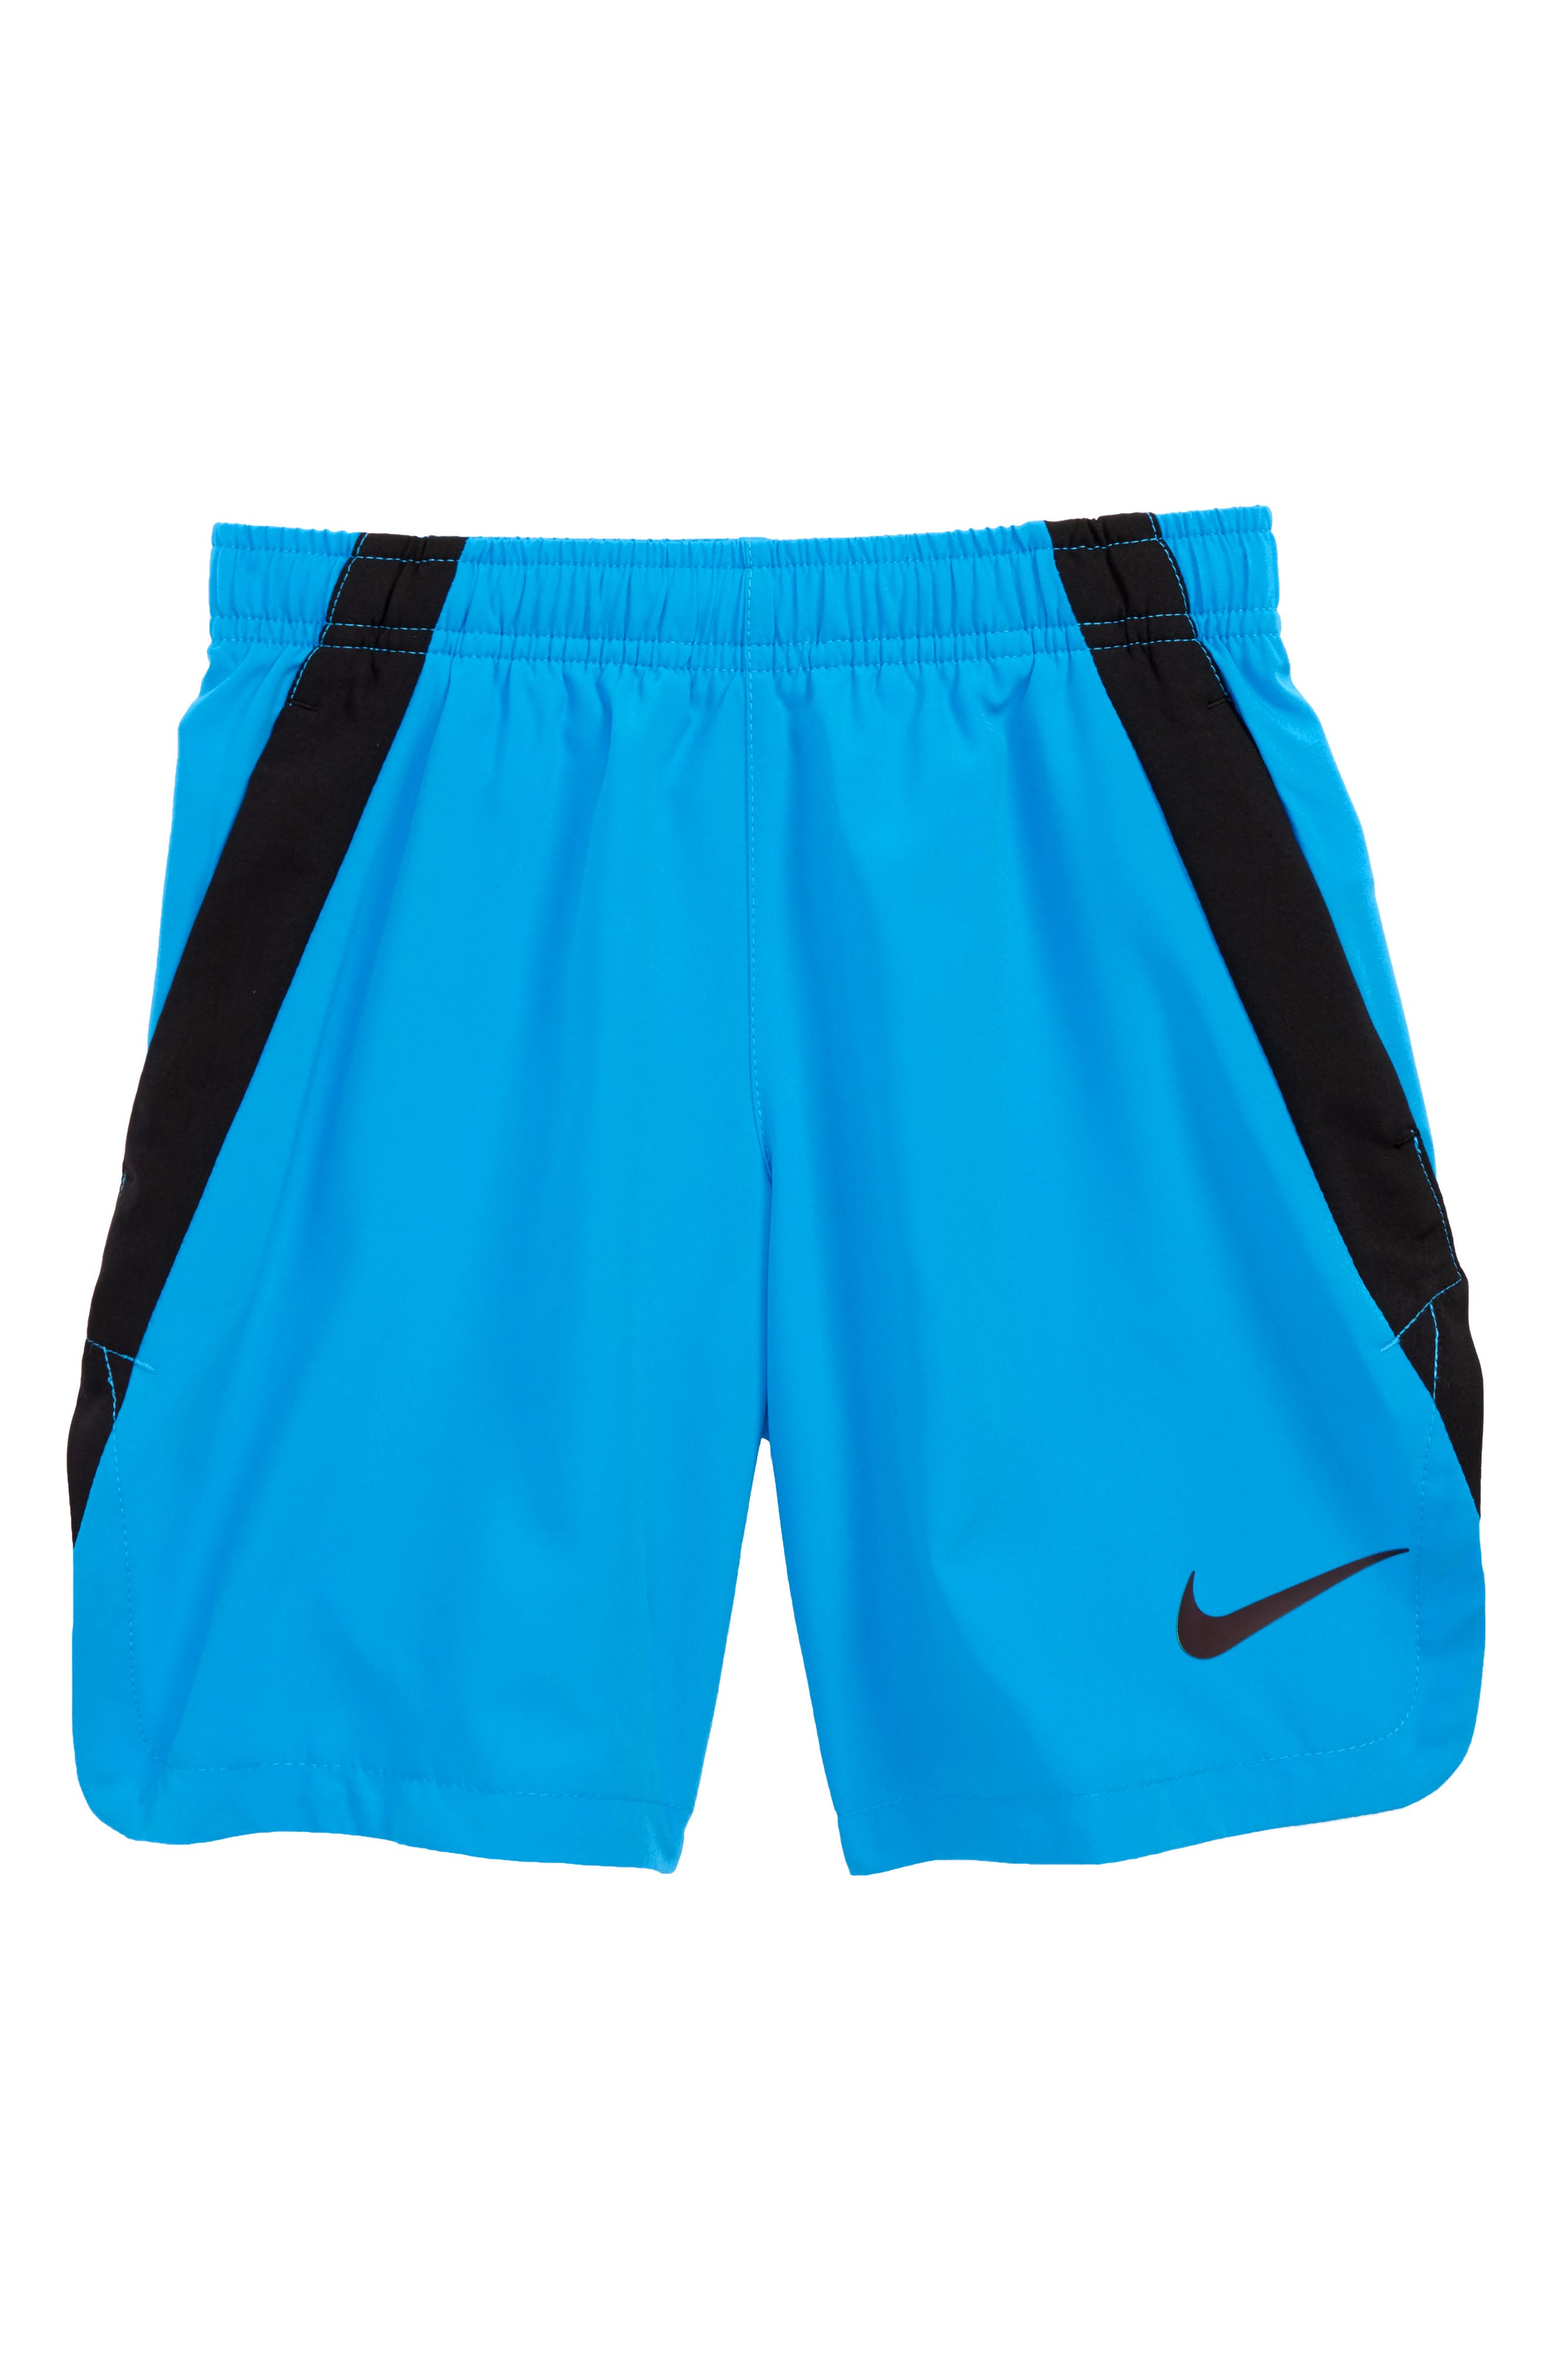 Dry Vent Shorts,                             Main thumbnail 1, color,                             Equator Blue